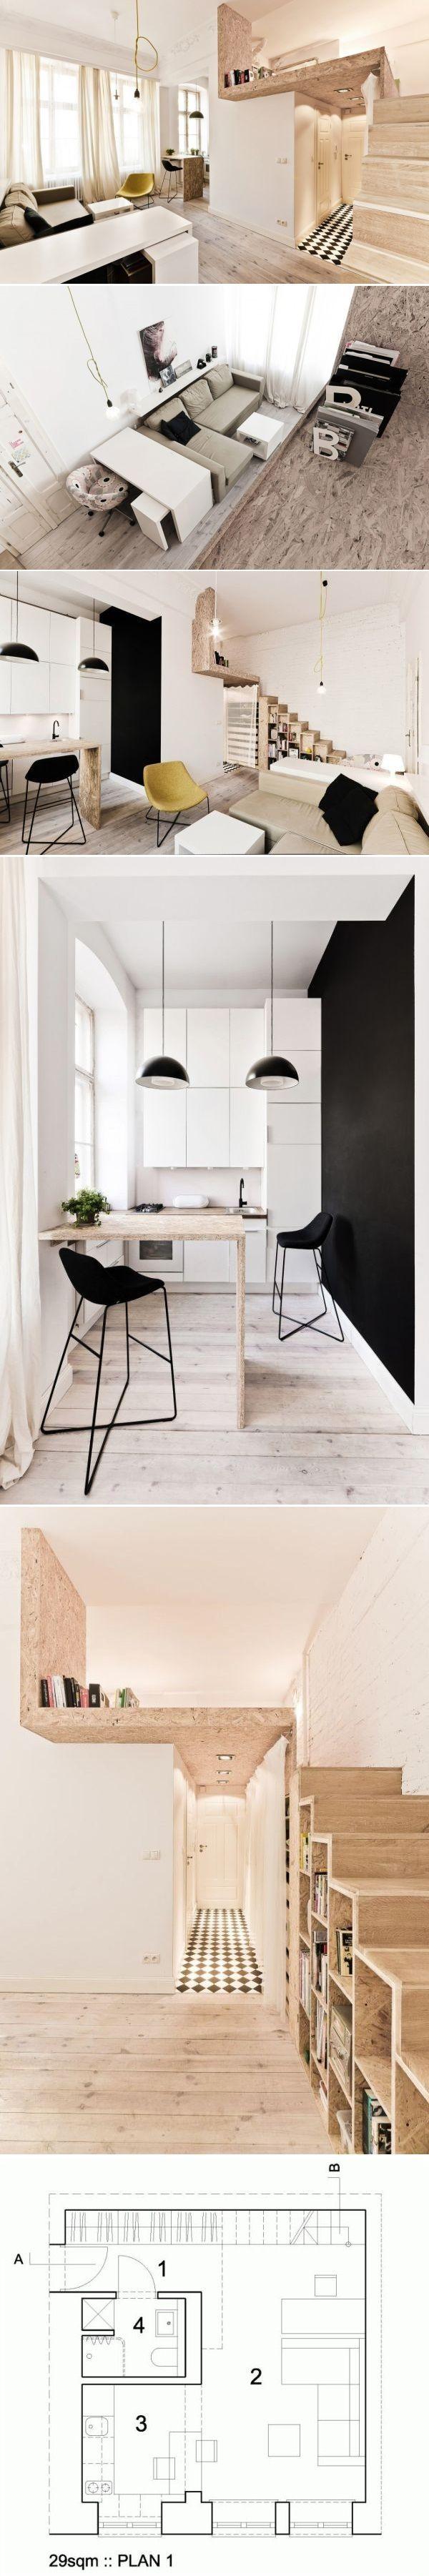 best interior design images on pinterest cafes architecture